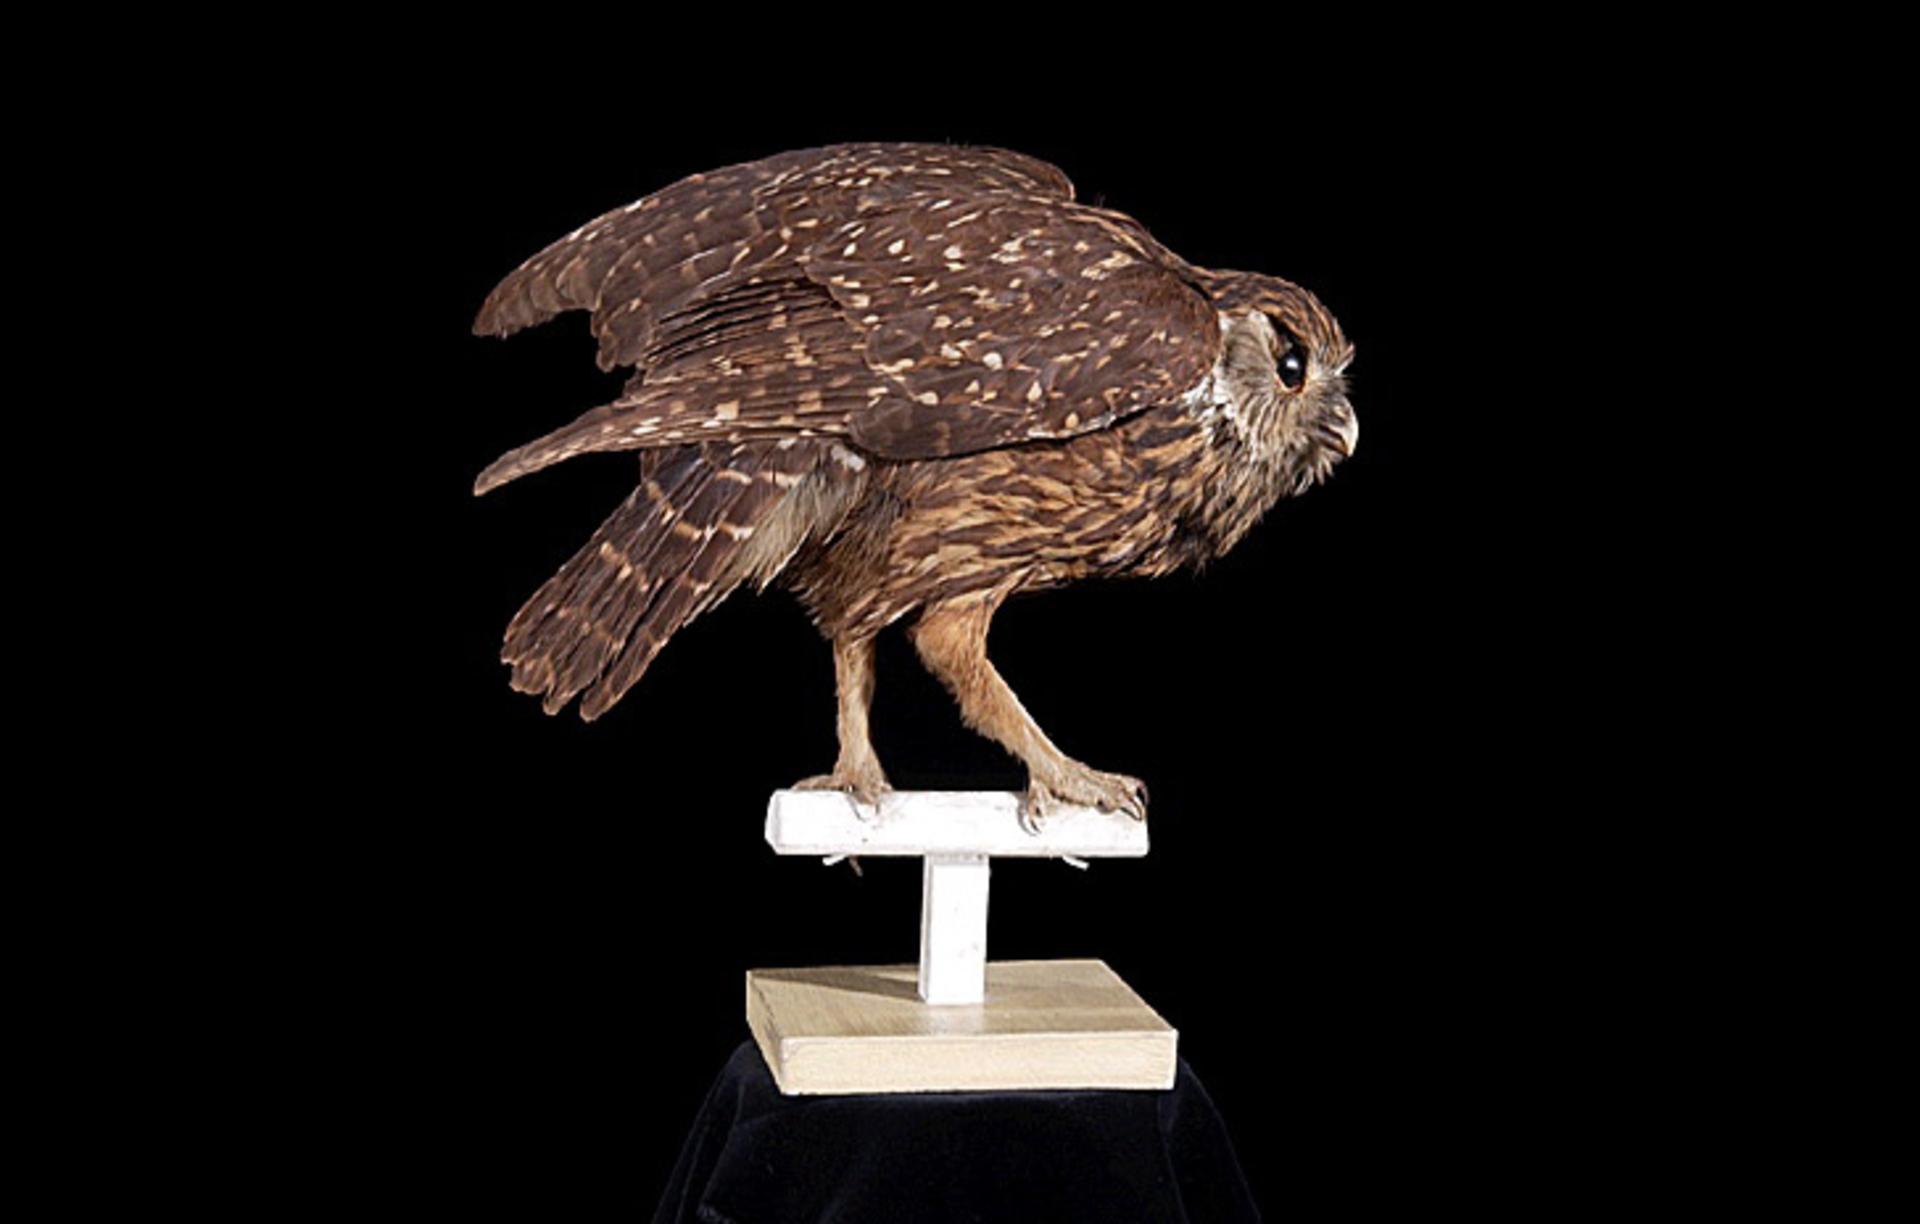 RMNH.AVES.110070 | Sceloglaux albifacies albifacies (Gray, 1844)